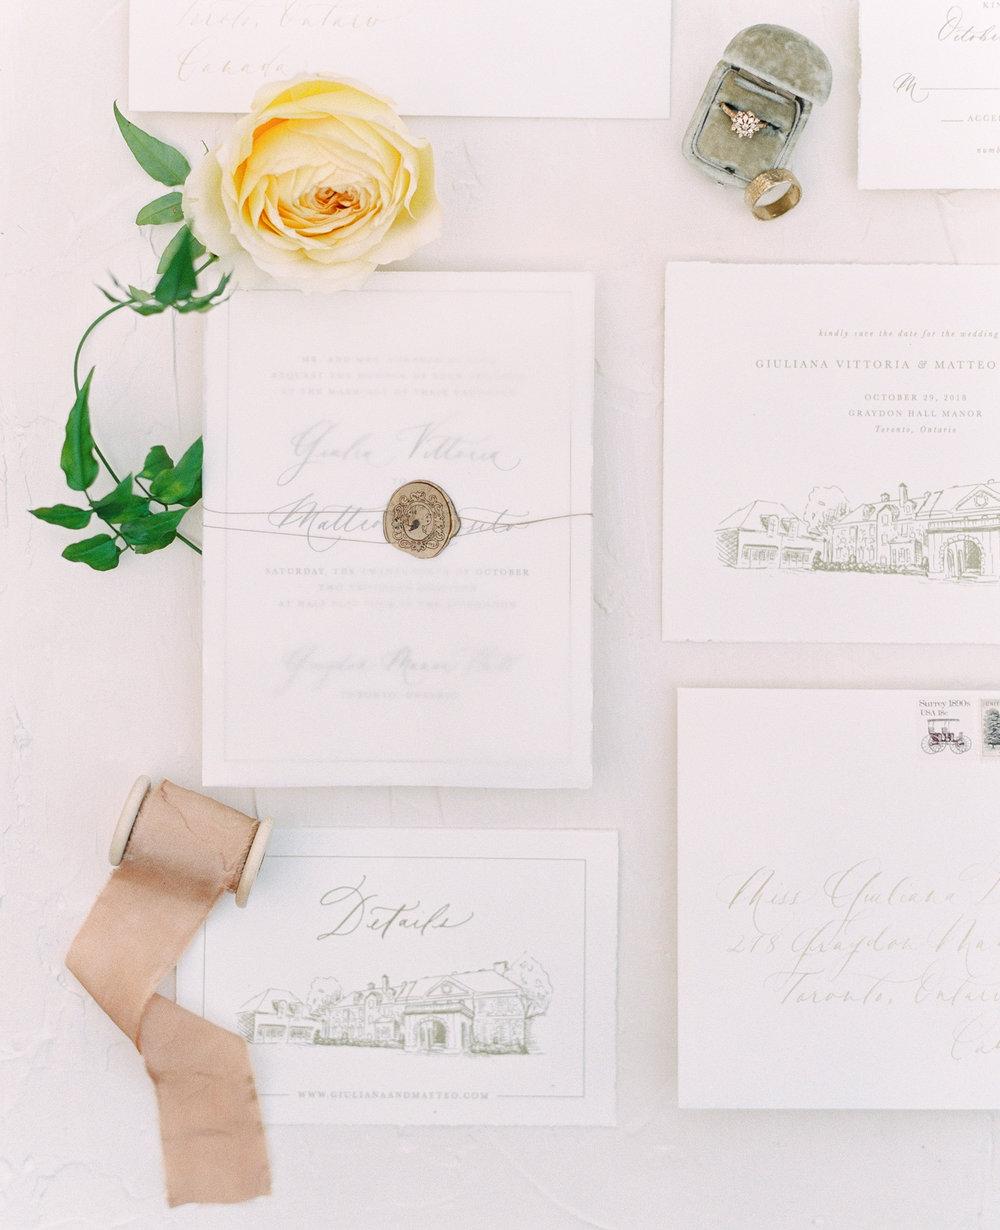 Graydon Hall Manor Fine Art Wedding